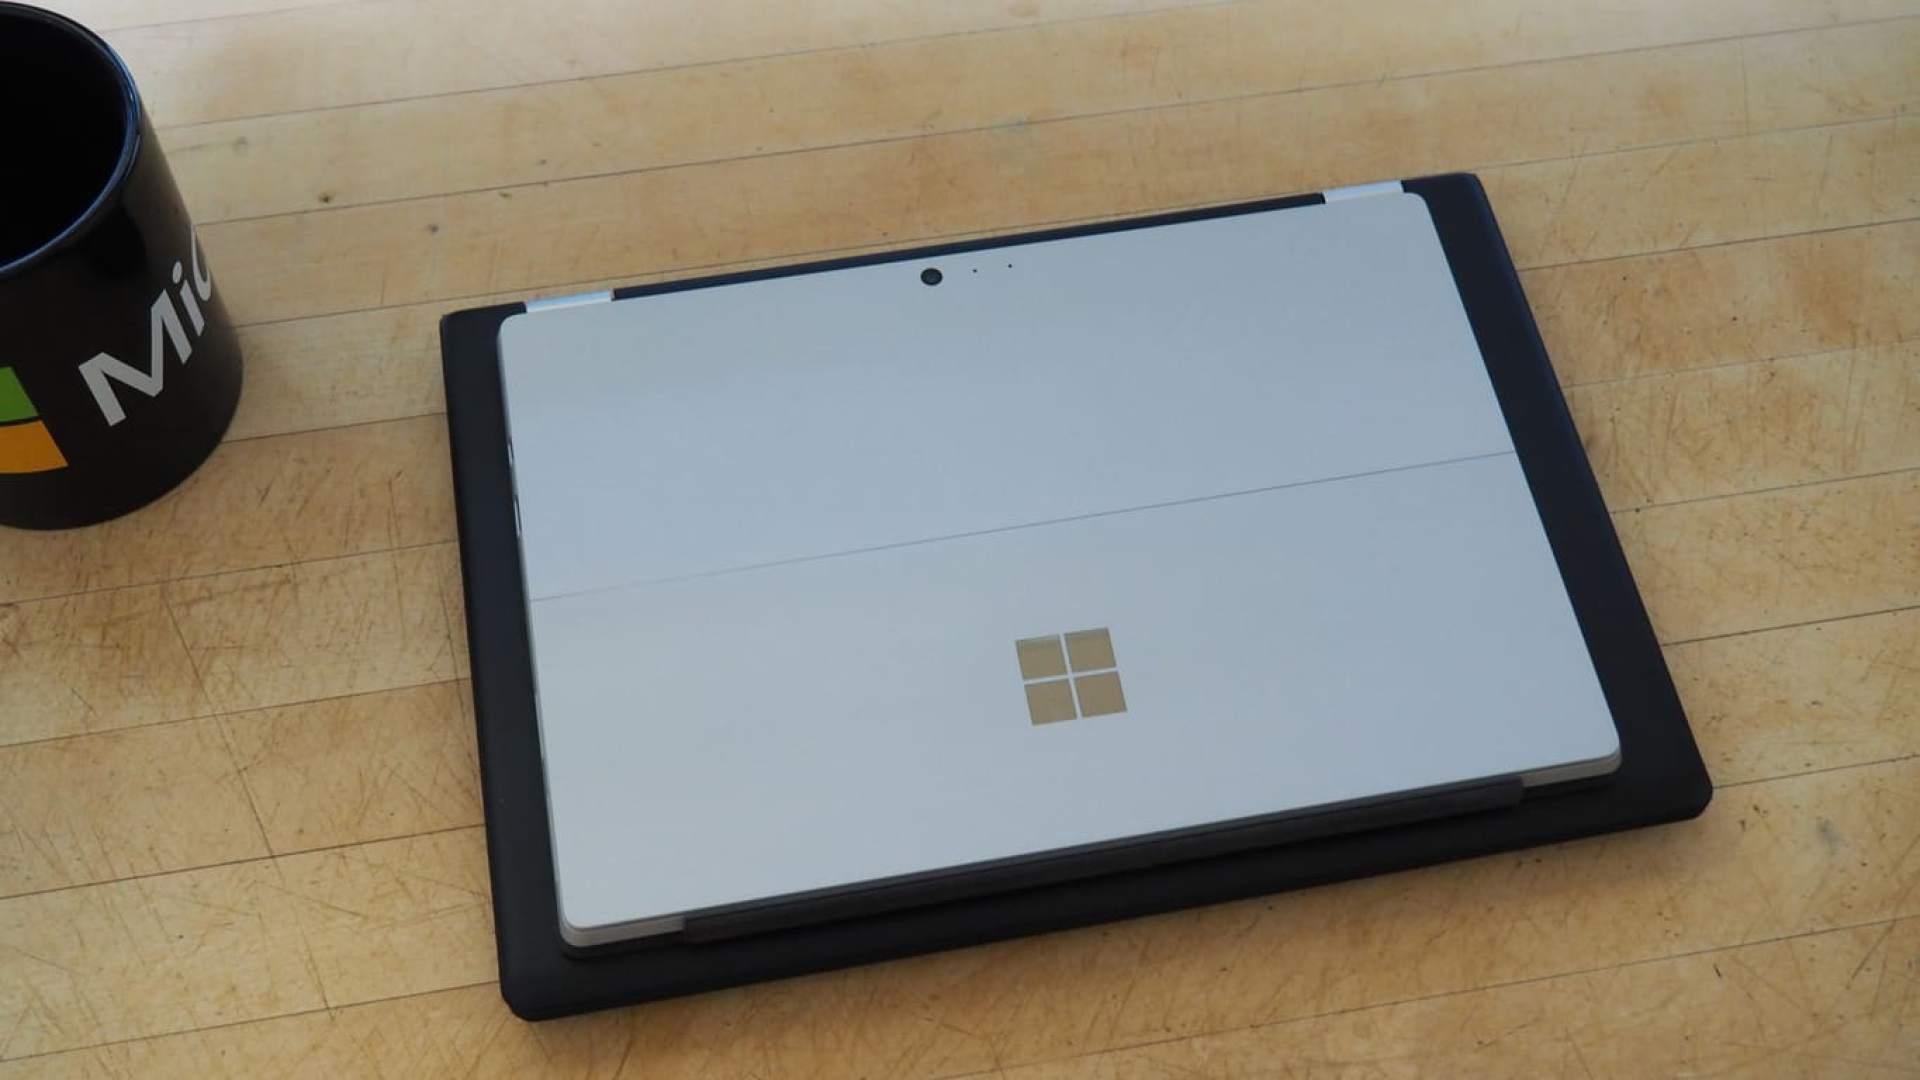 Lenovo Yoga 700 vs Surface Pro 4 Size